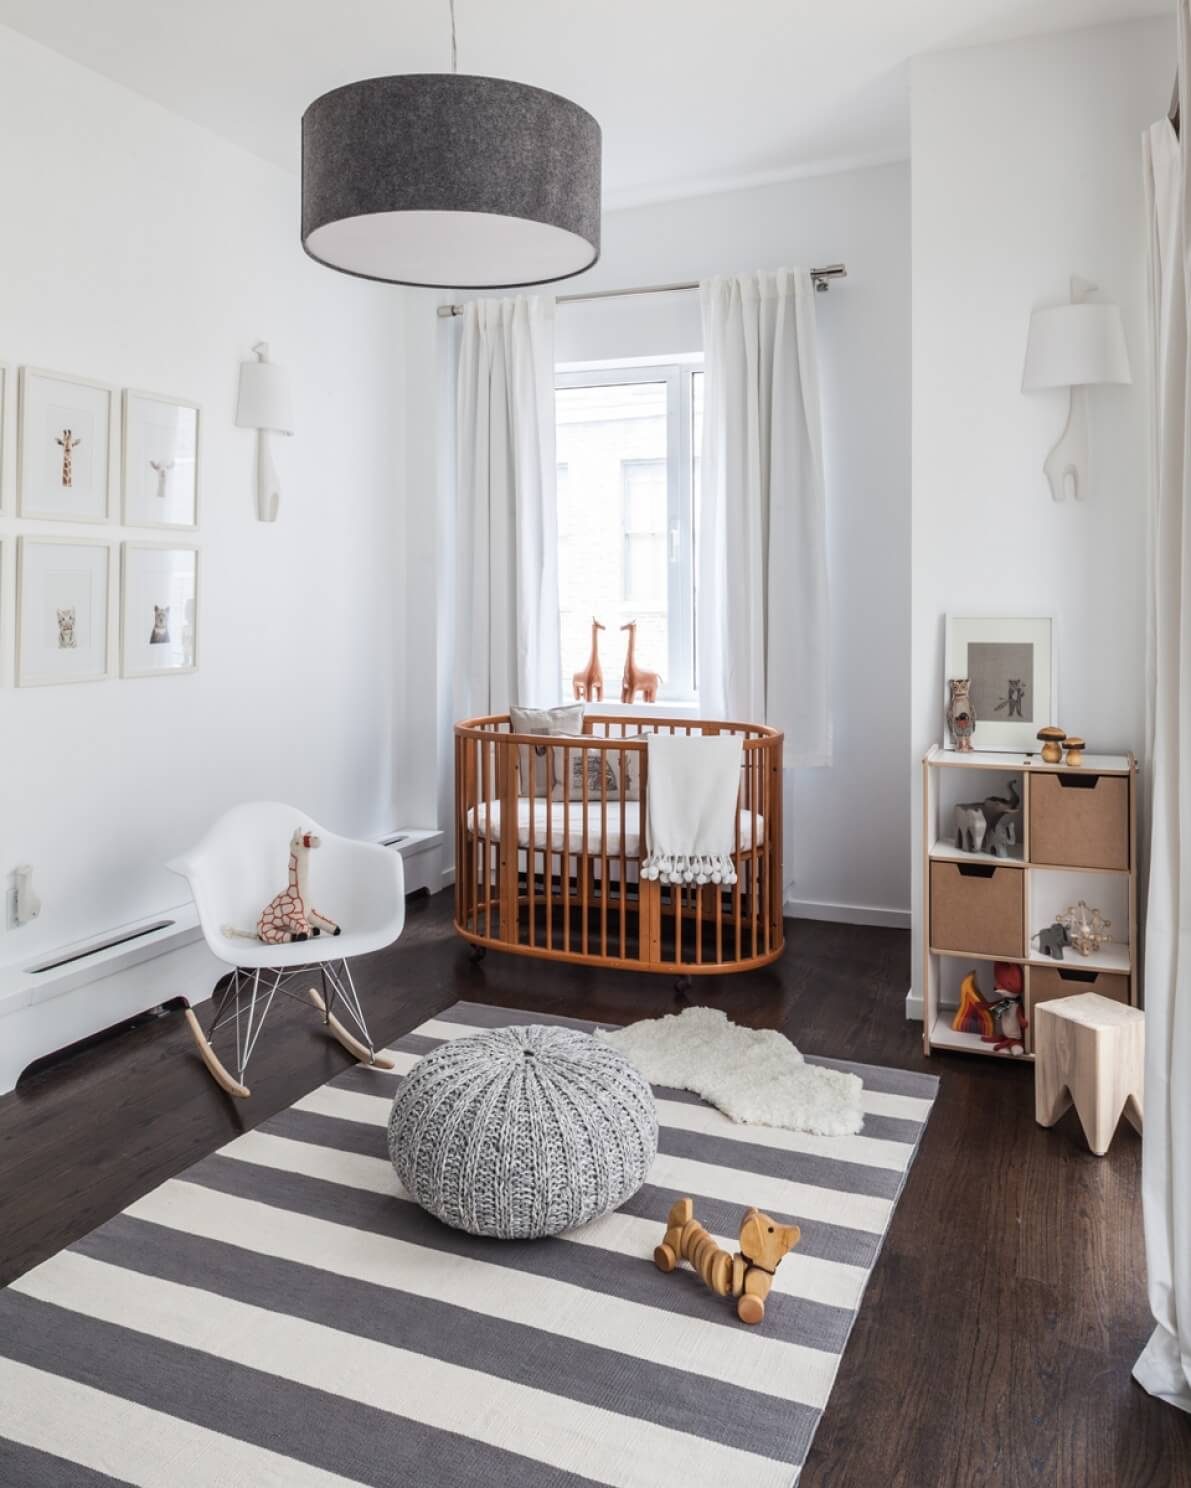 35+ Best Nursery Decor Ideas and Designs for 2019